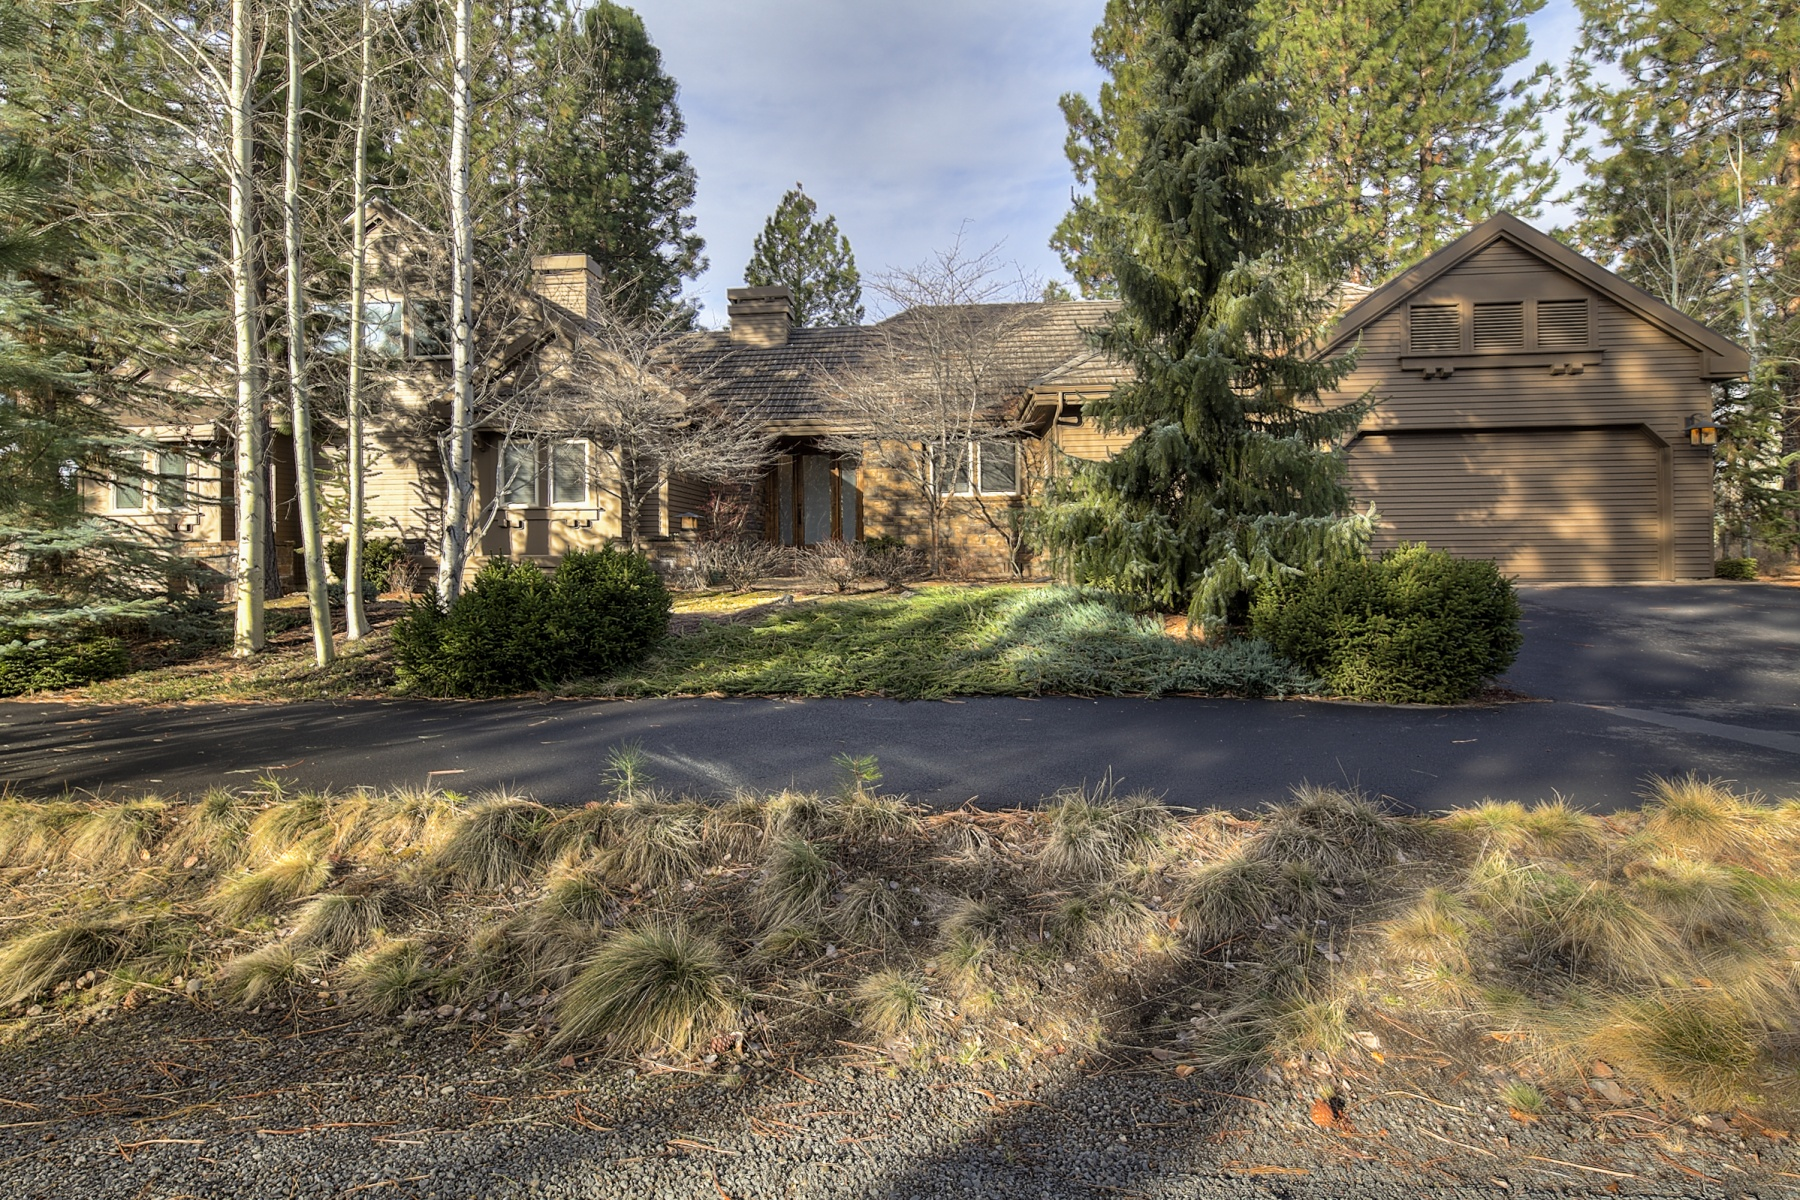 Casa para uma família para Venda às Broken Top 61355 Tam McArthur Loop Bend, Oregon 97702 Estados Unidos